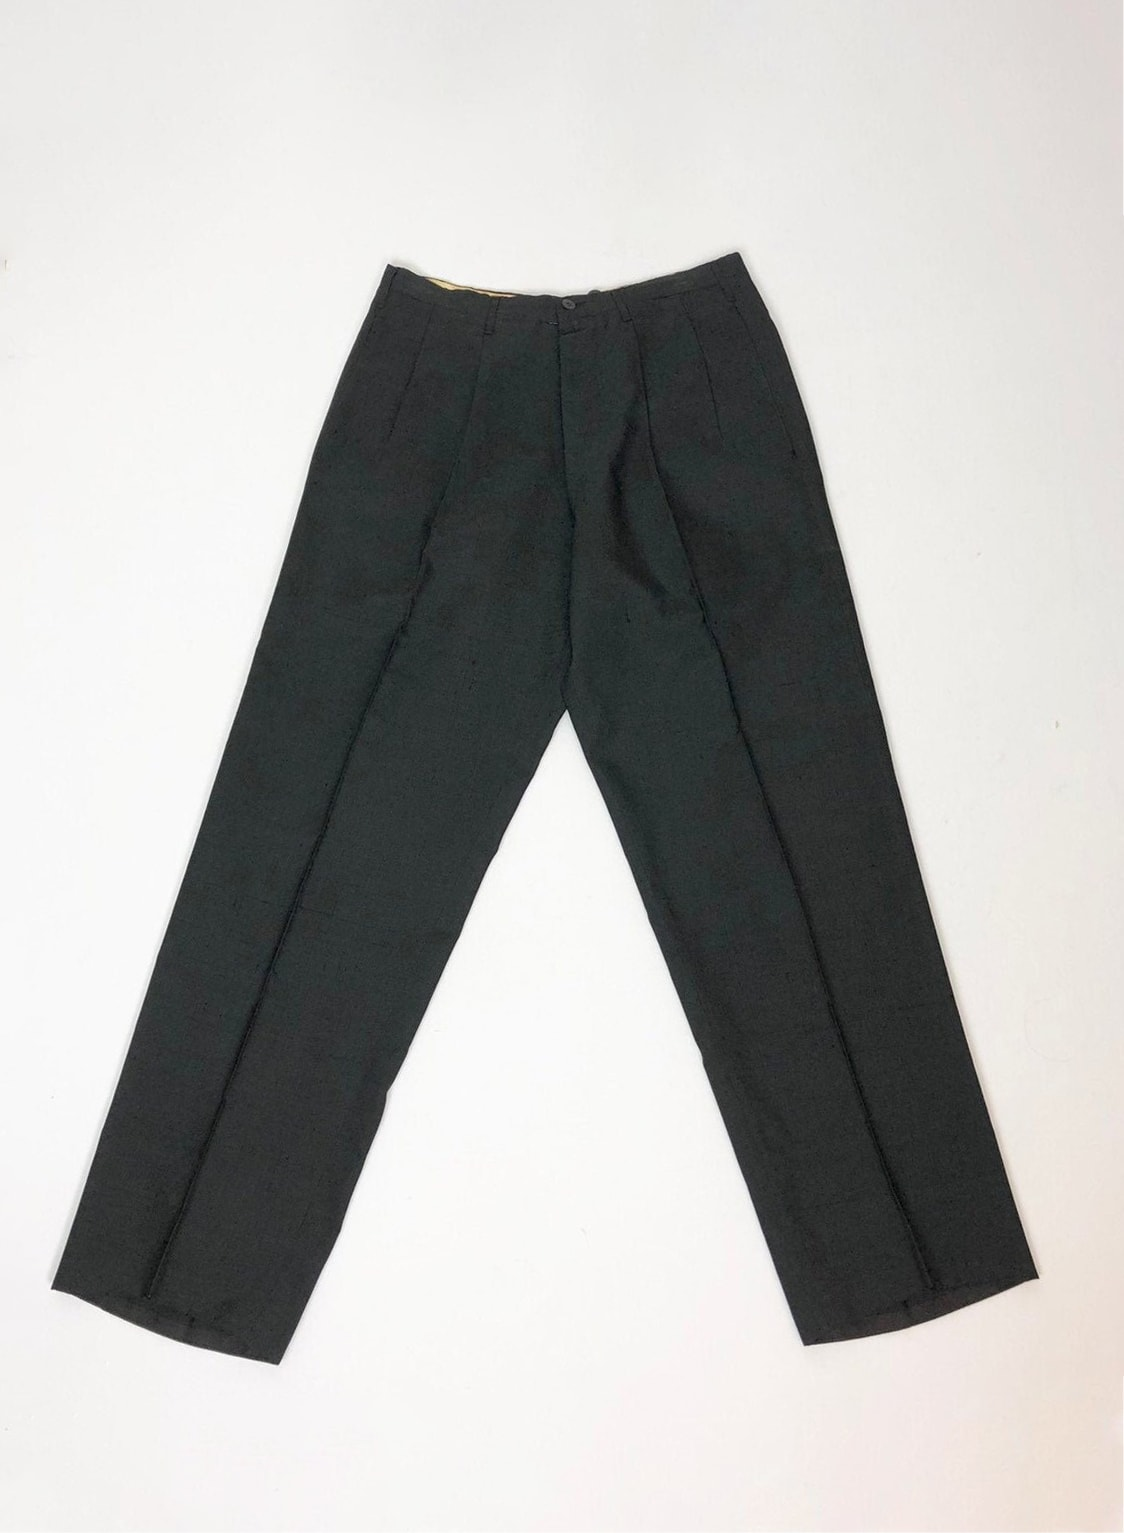 1910 1920s Silk Trousers 31 Waist